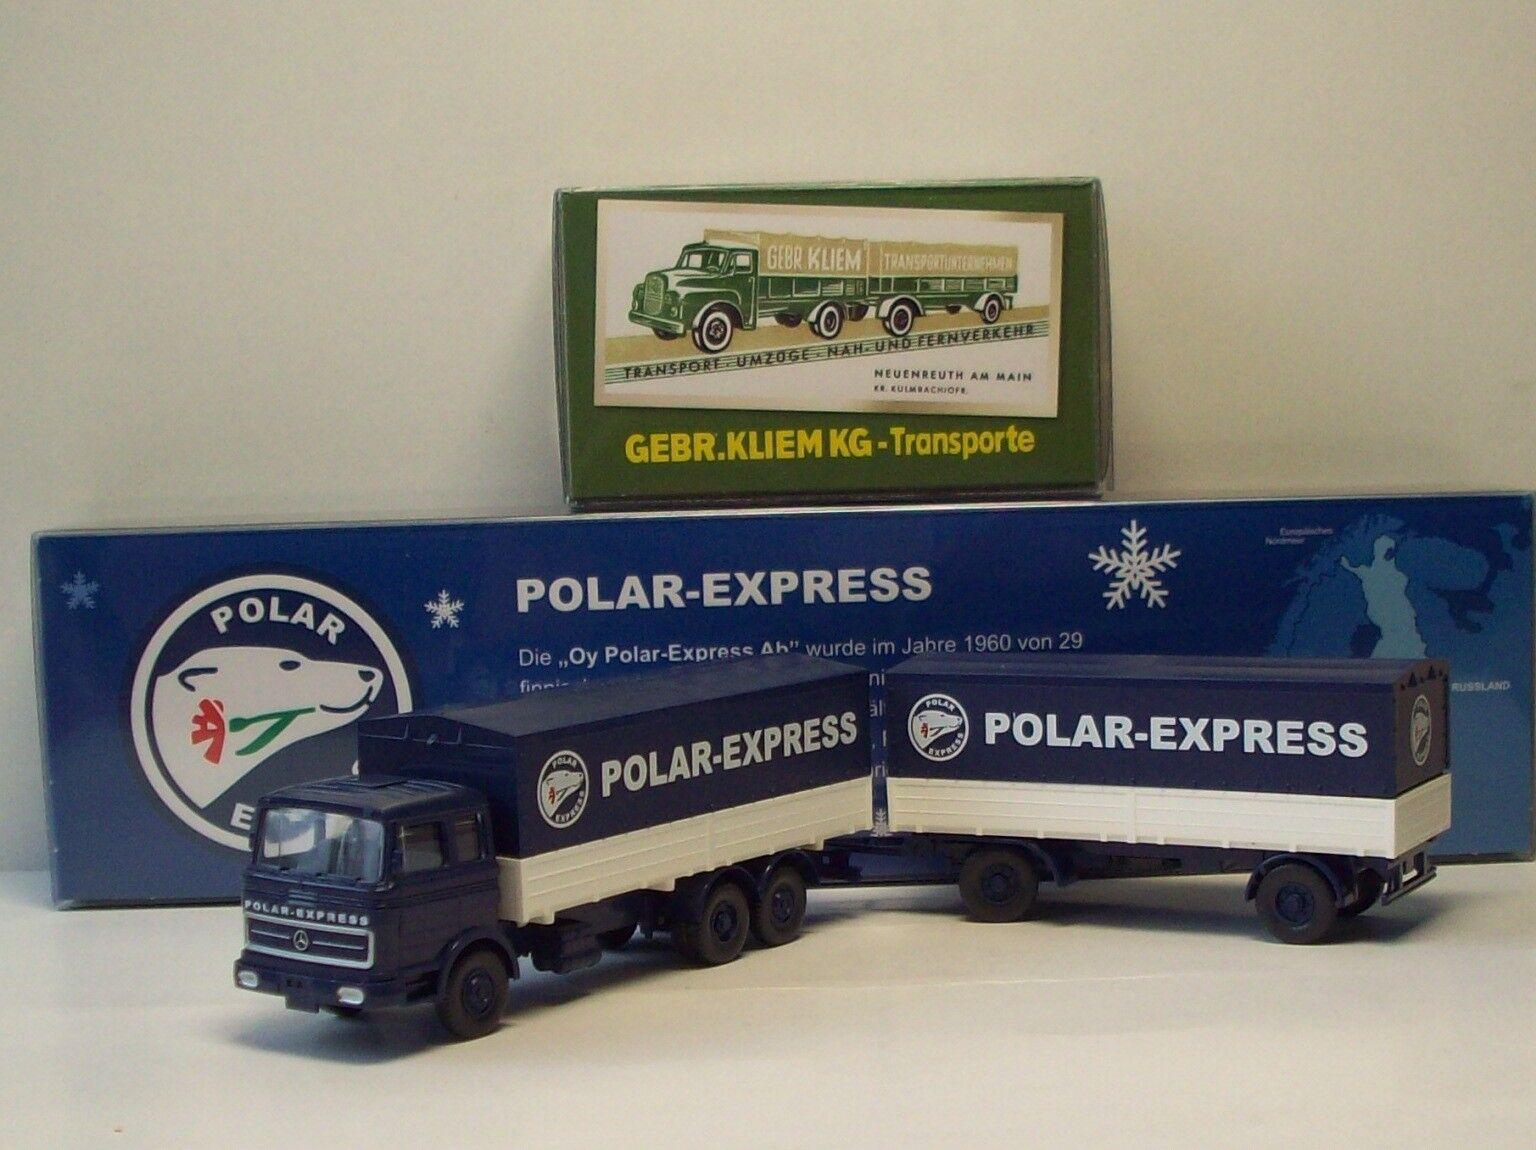 MB LP2232 3a 2a Pr-Hz Polar-Express (ASG ) Wiking Sonder-Modell v. Kliem u.  | Qualität Produkte